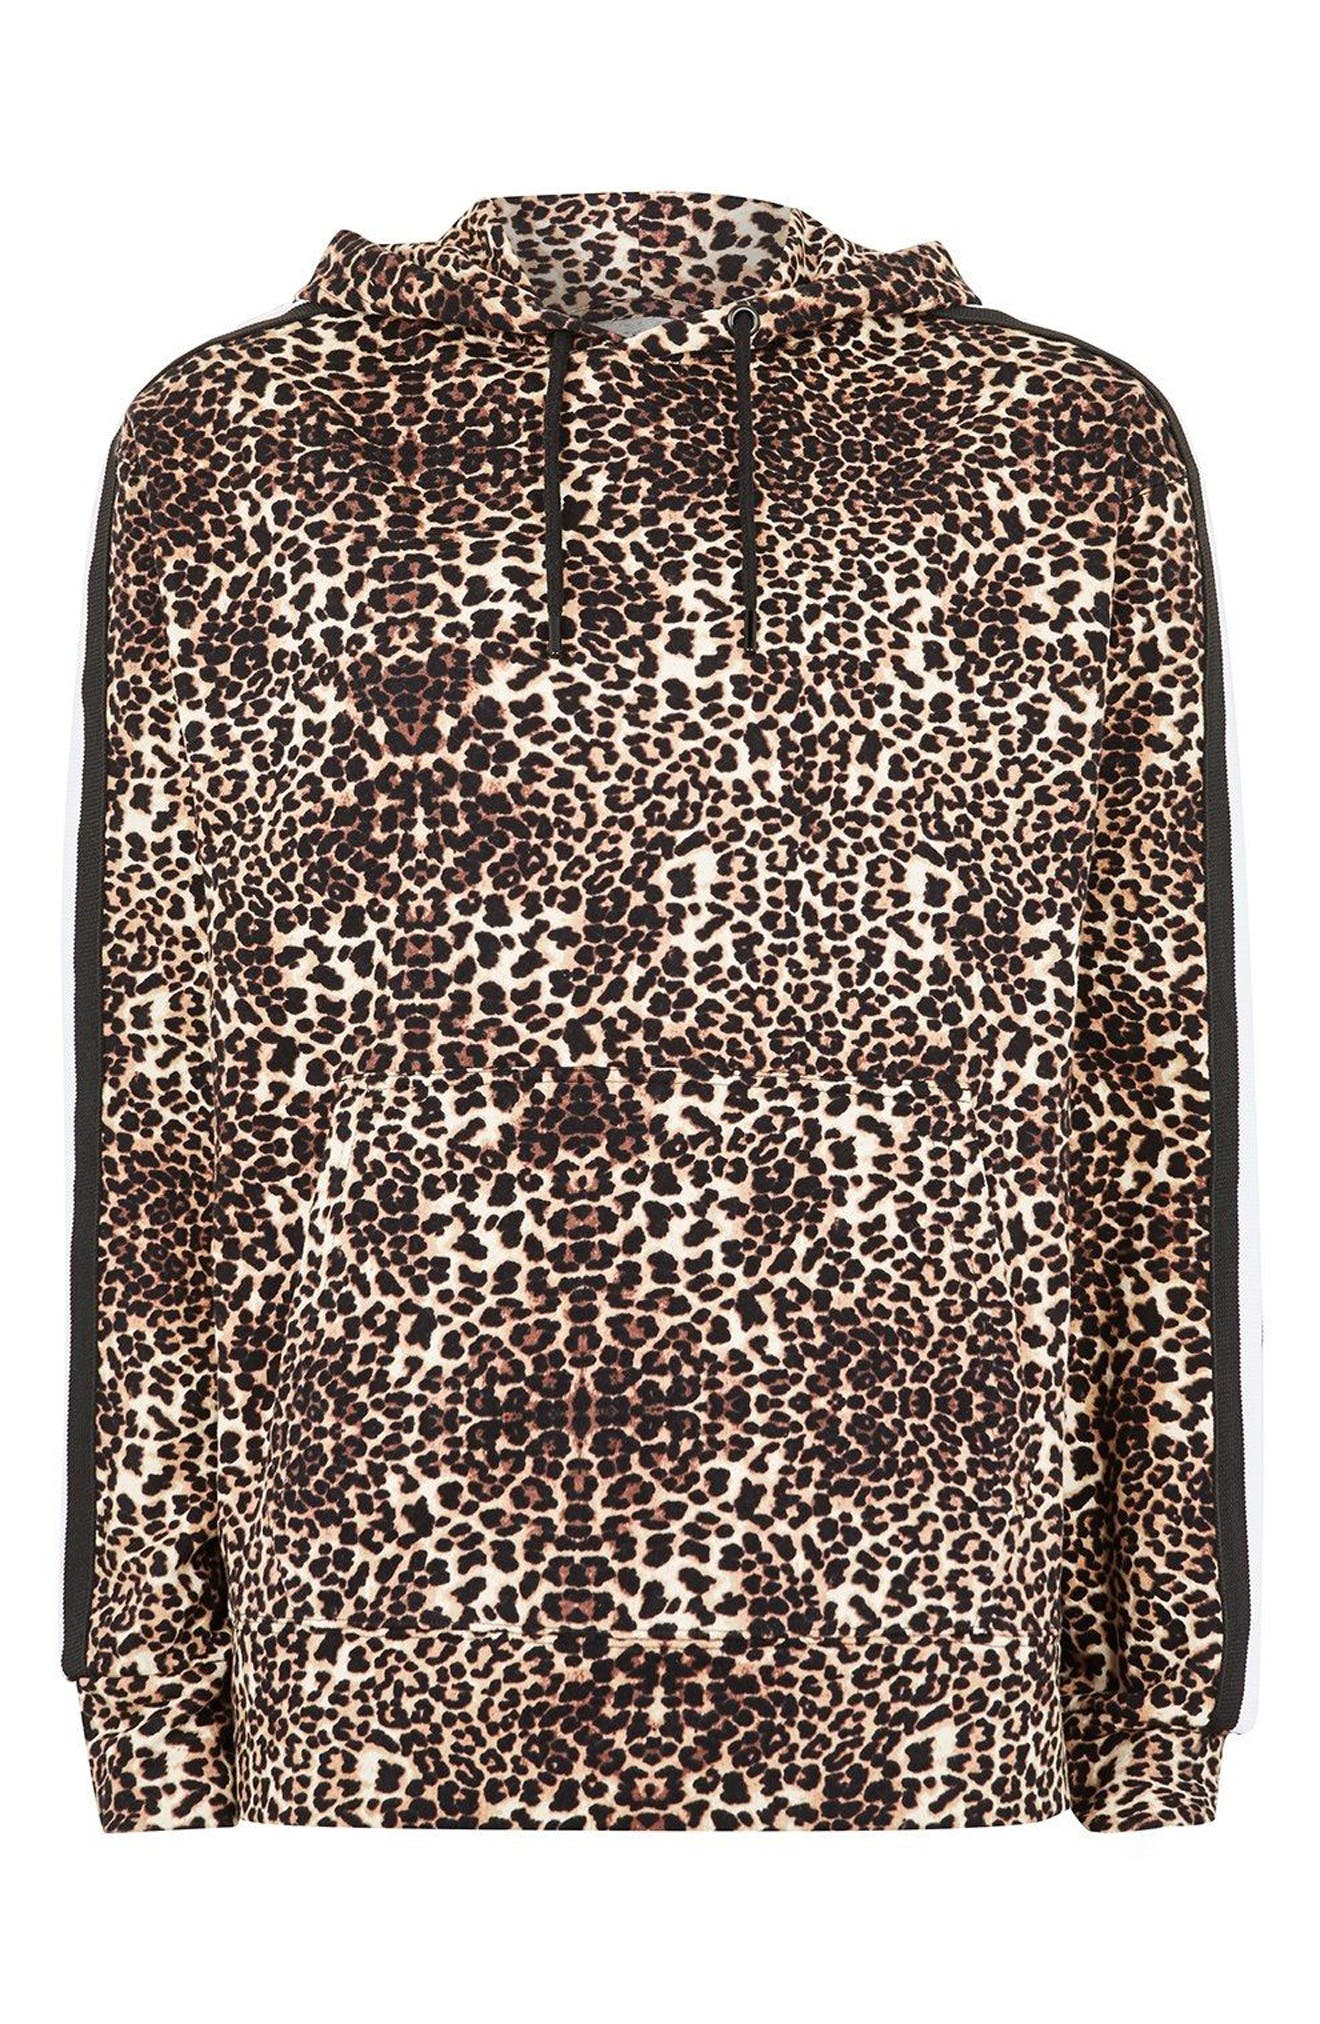 Leopard Print Hoodie,                             Main thumbnail 1, color,                             Brown Multi